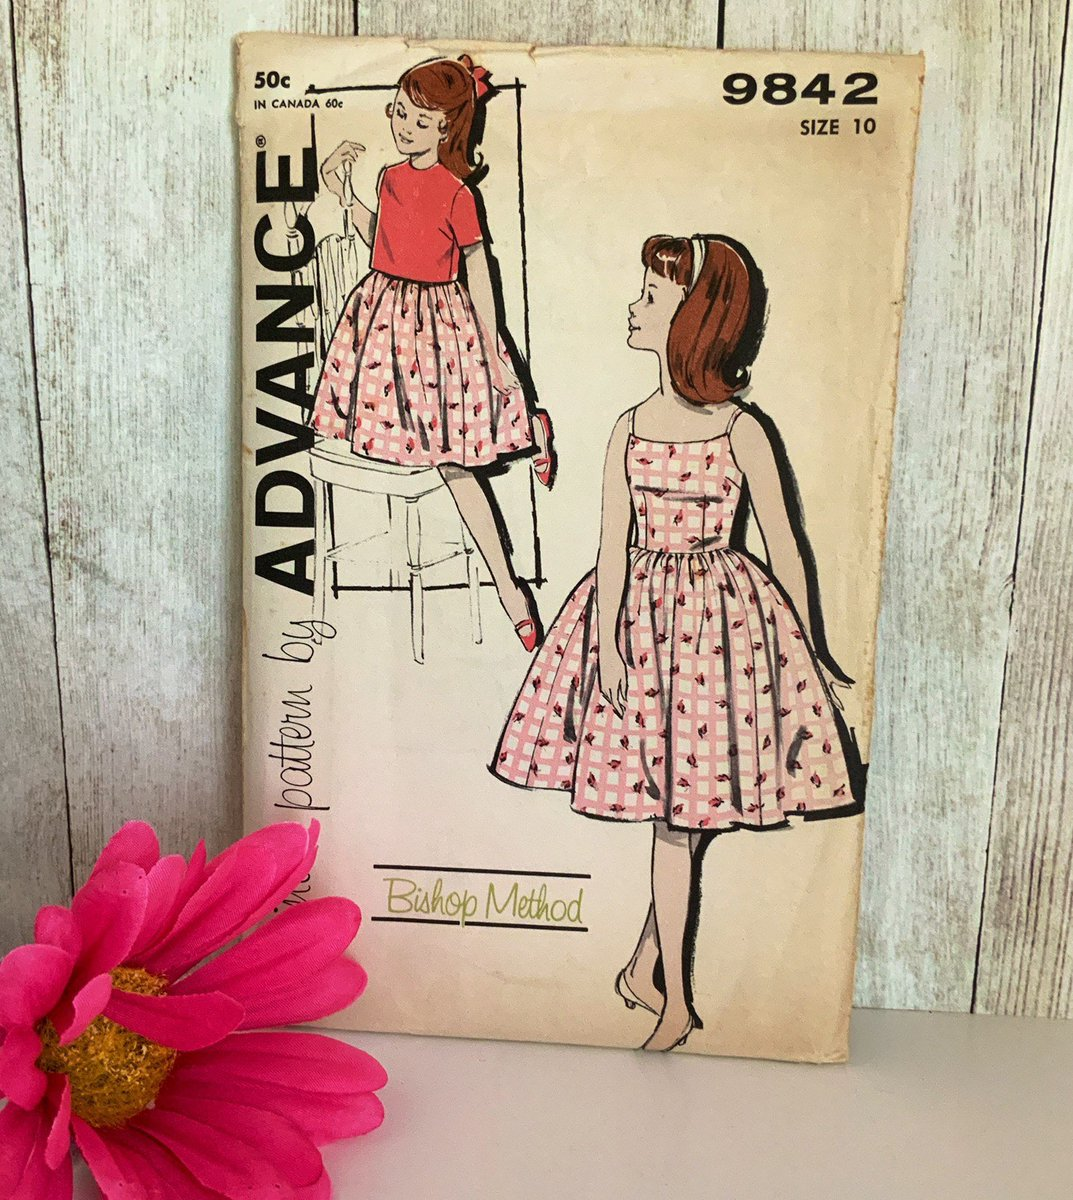 Vintage Advance 9842 Sewing Pattern, 1950s Girl Dress Pattern, Vintage Sewing #etsy #supplies #independenceday #sewing #birthday #fashionillustration #50sdress #girlsdress #advancepattern #girlssewingpattern etsy.me/32GyfBZ